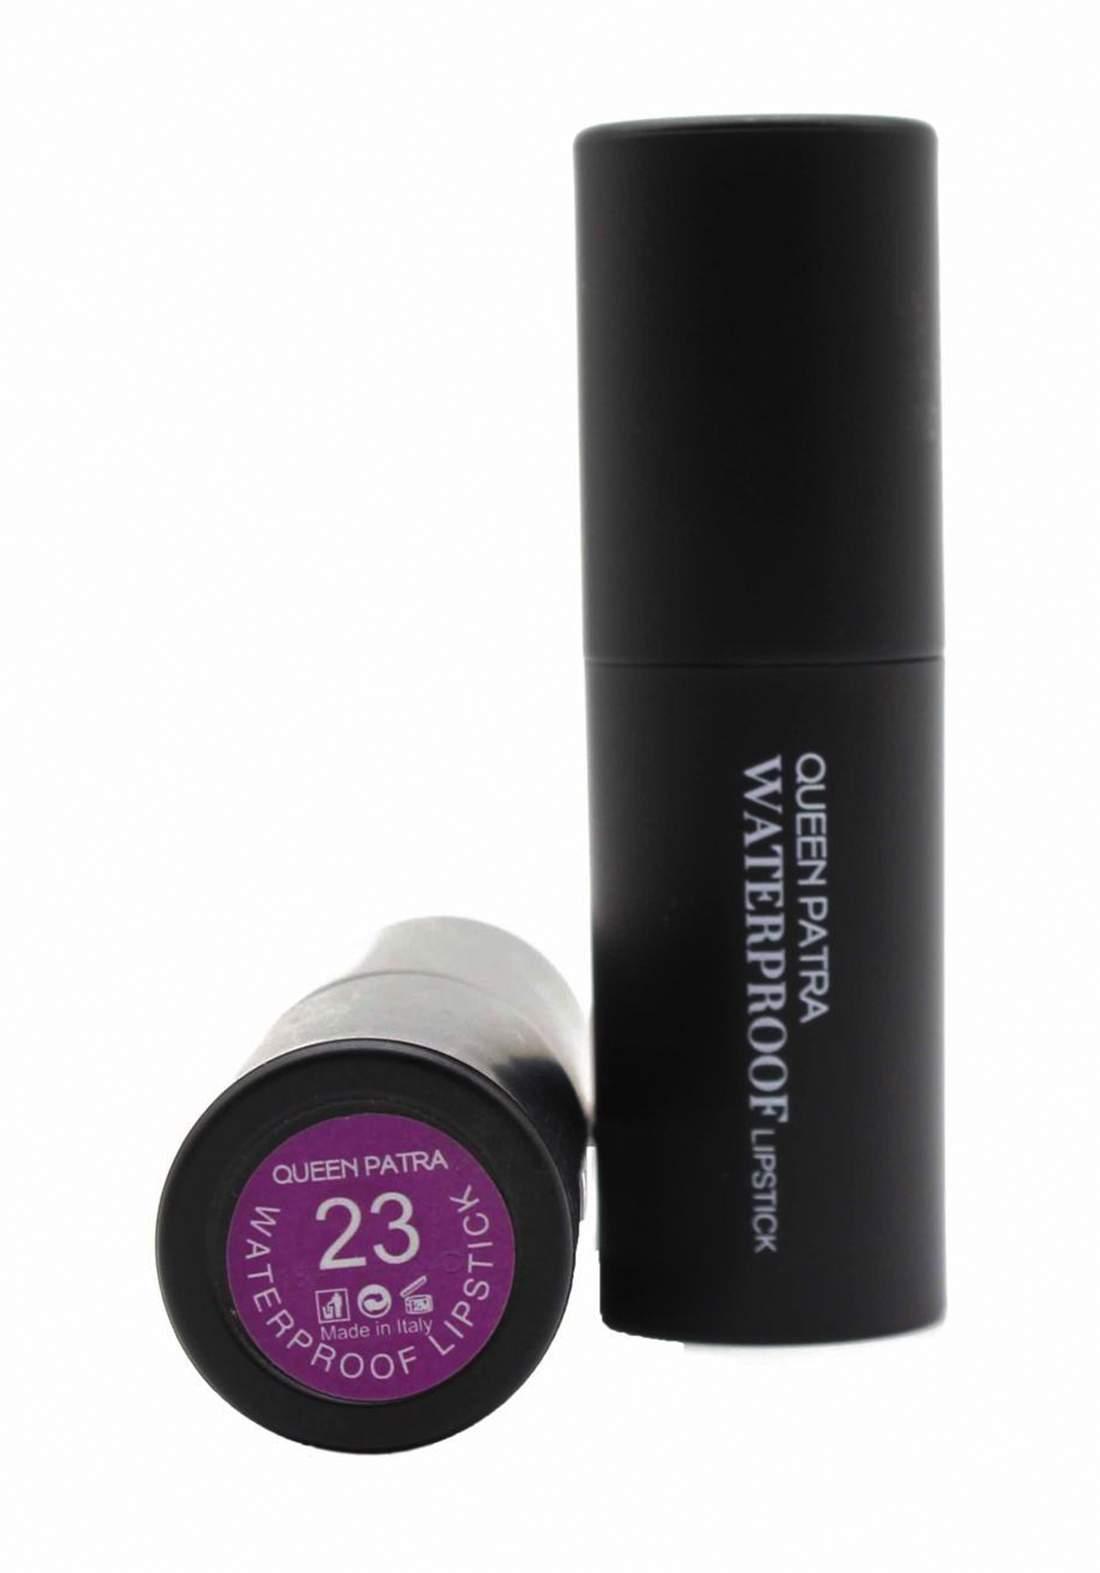 Queen Batra Waterproof Lipstick No.023 احمر شفاه